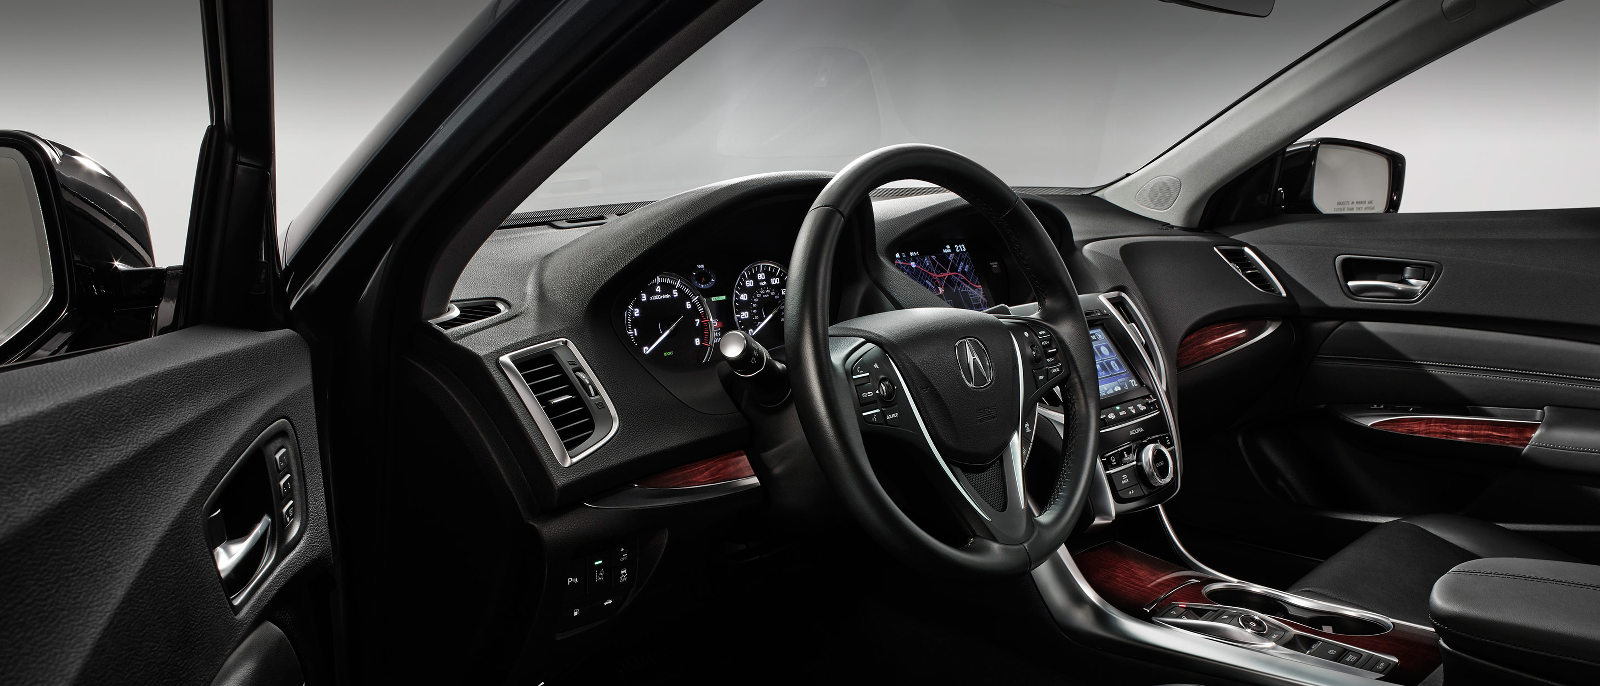 2015 Acura TLX Dublin Columbus | Acura Columbus